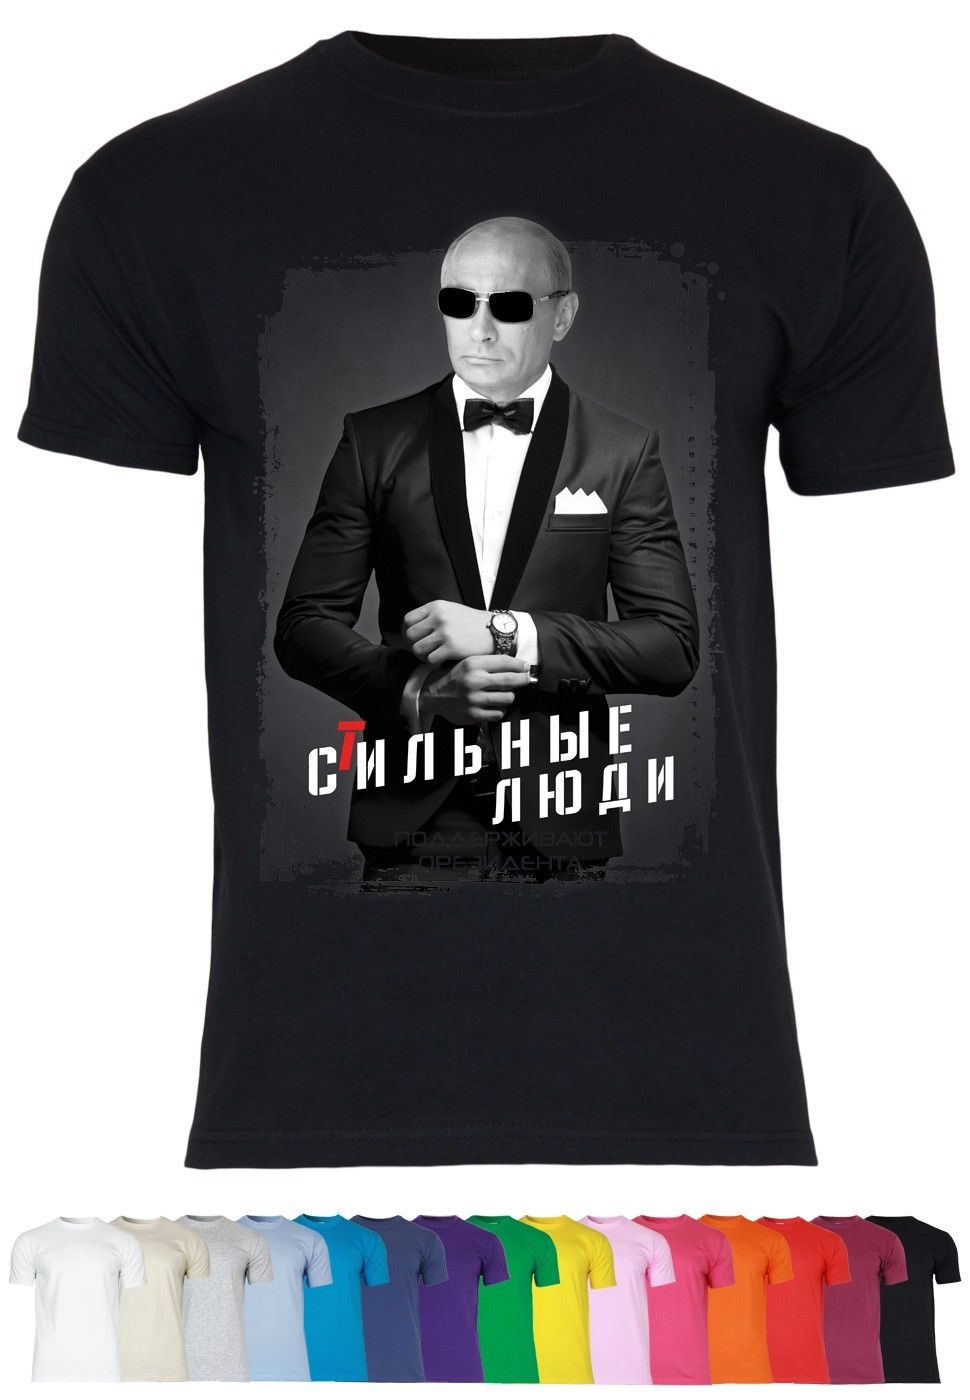 M26 F140 Herren T-Shirt mit Motiv Russia President Putin in Tux  Russland Moskau